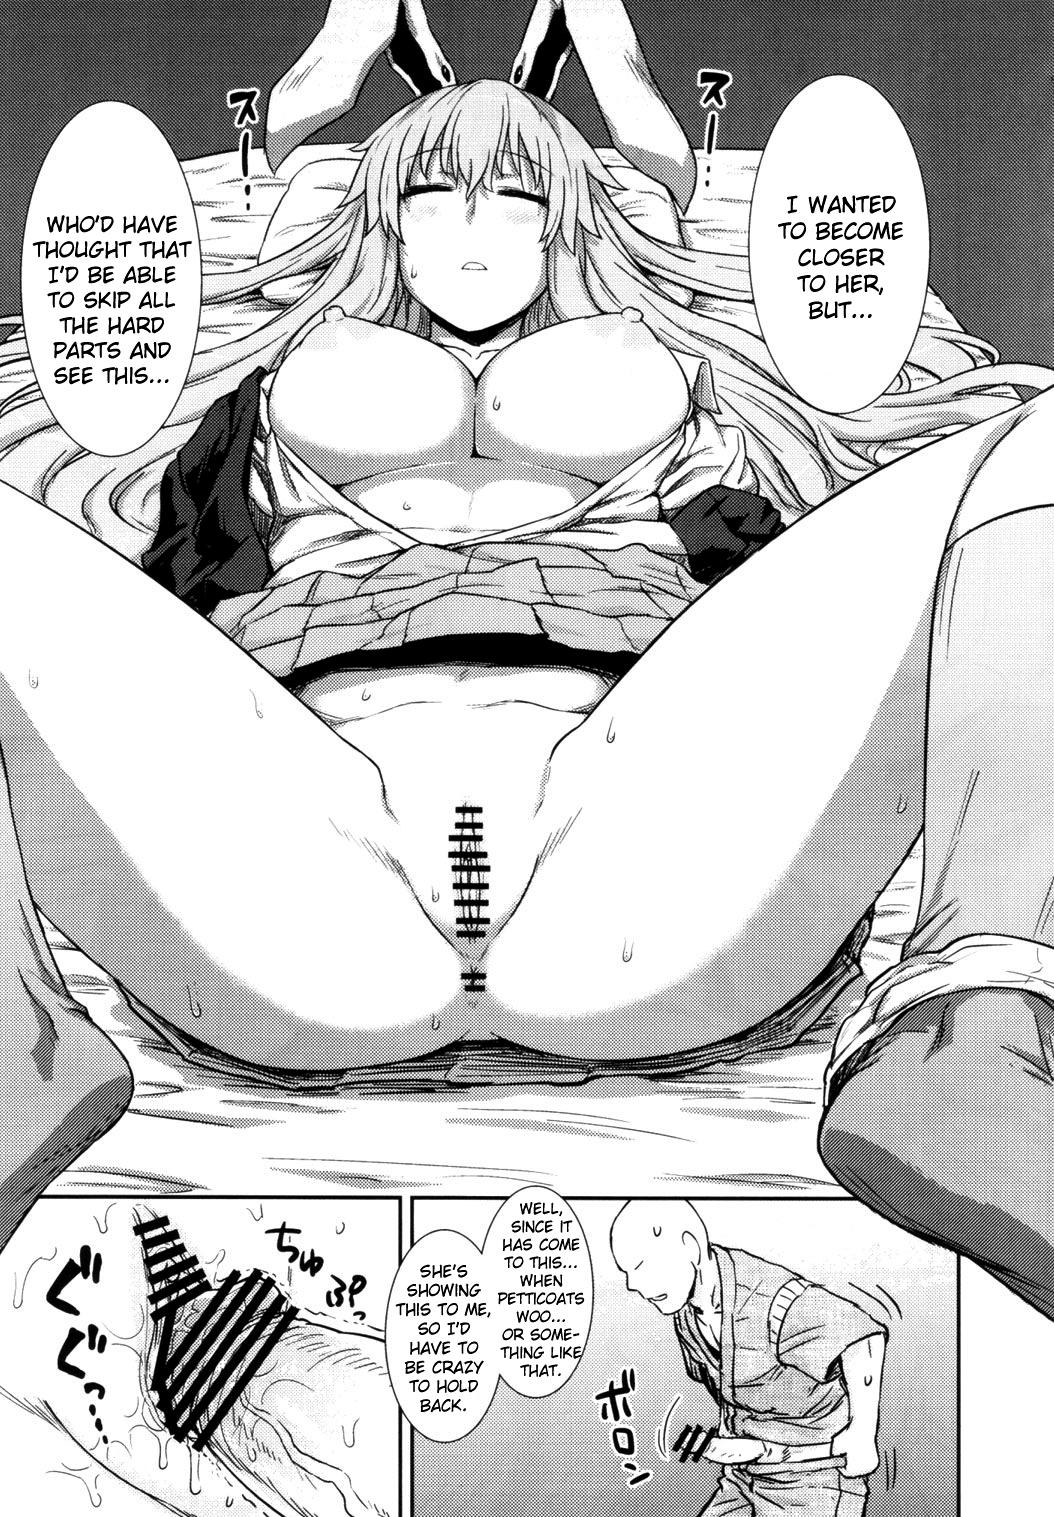 (Reitaisai 9) [various] Touhou Sleep Sex Anthology ch1-3, 6-8, 10, 14, 16, 19, 21 (Touhou Project) [English] {pesu} 76